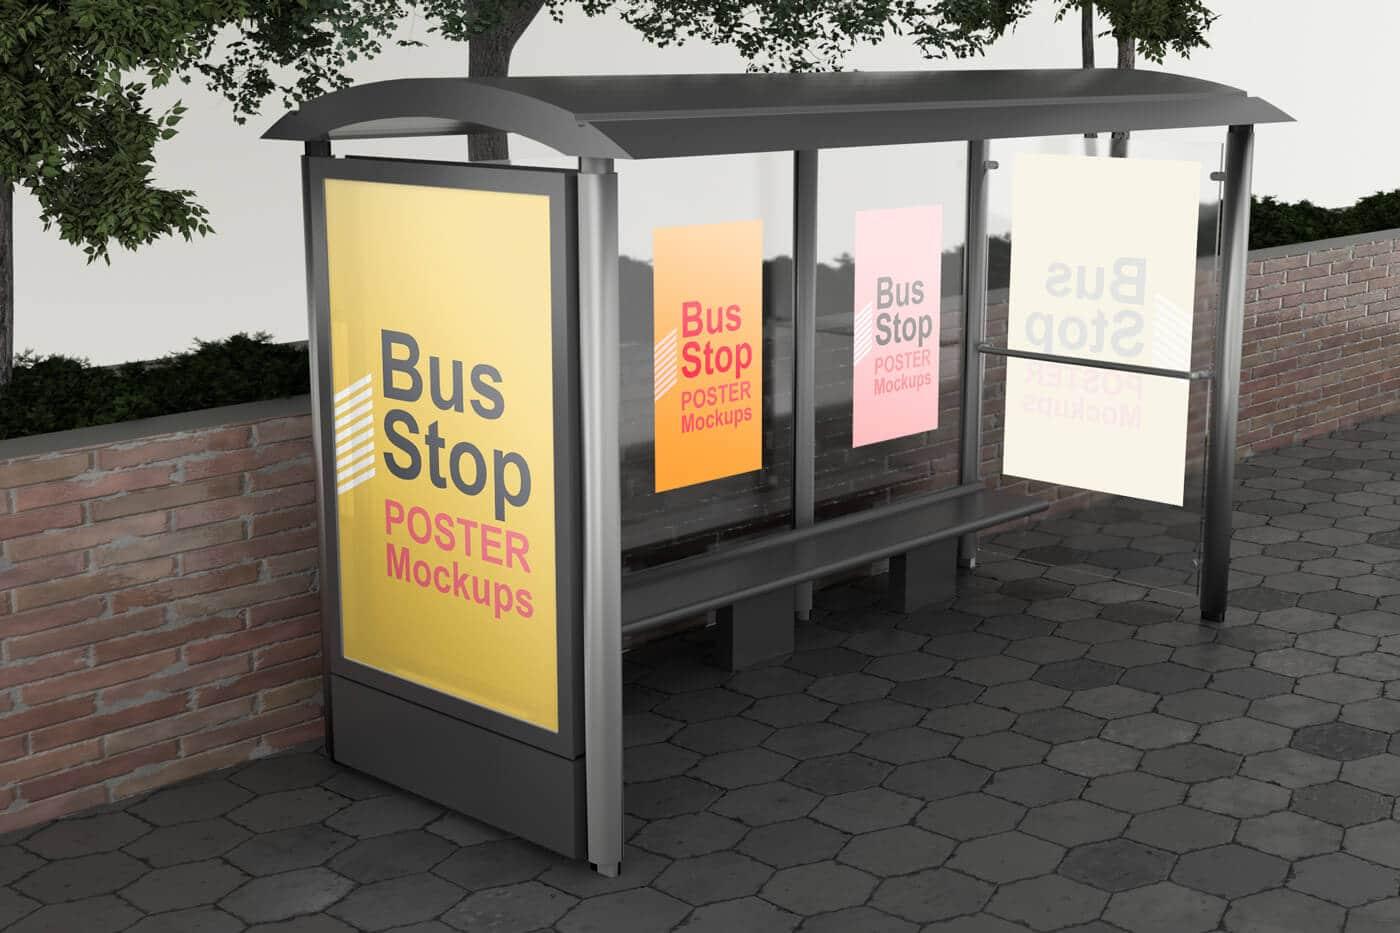 Bus Stop Poster Mockups